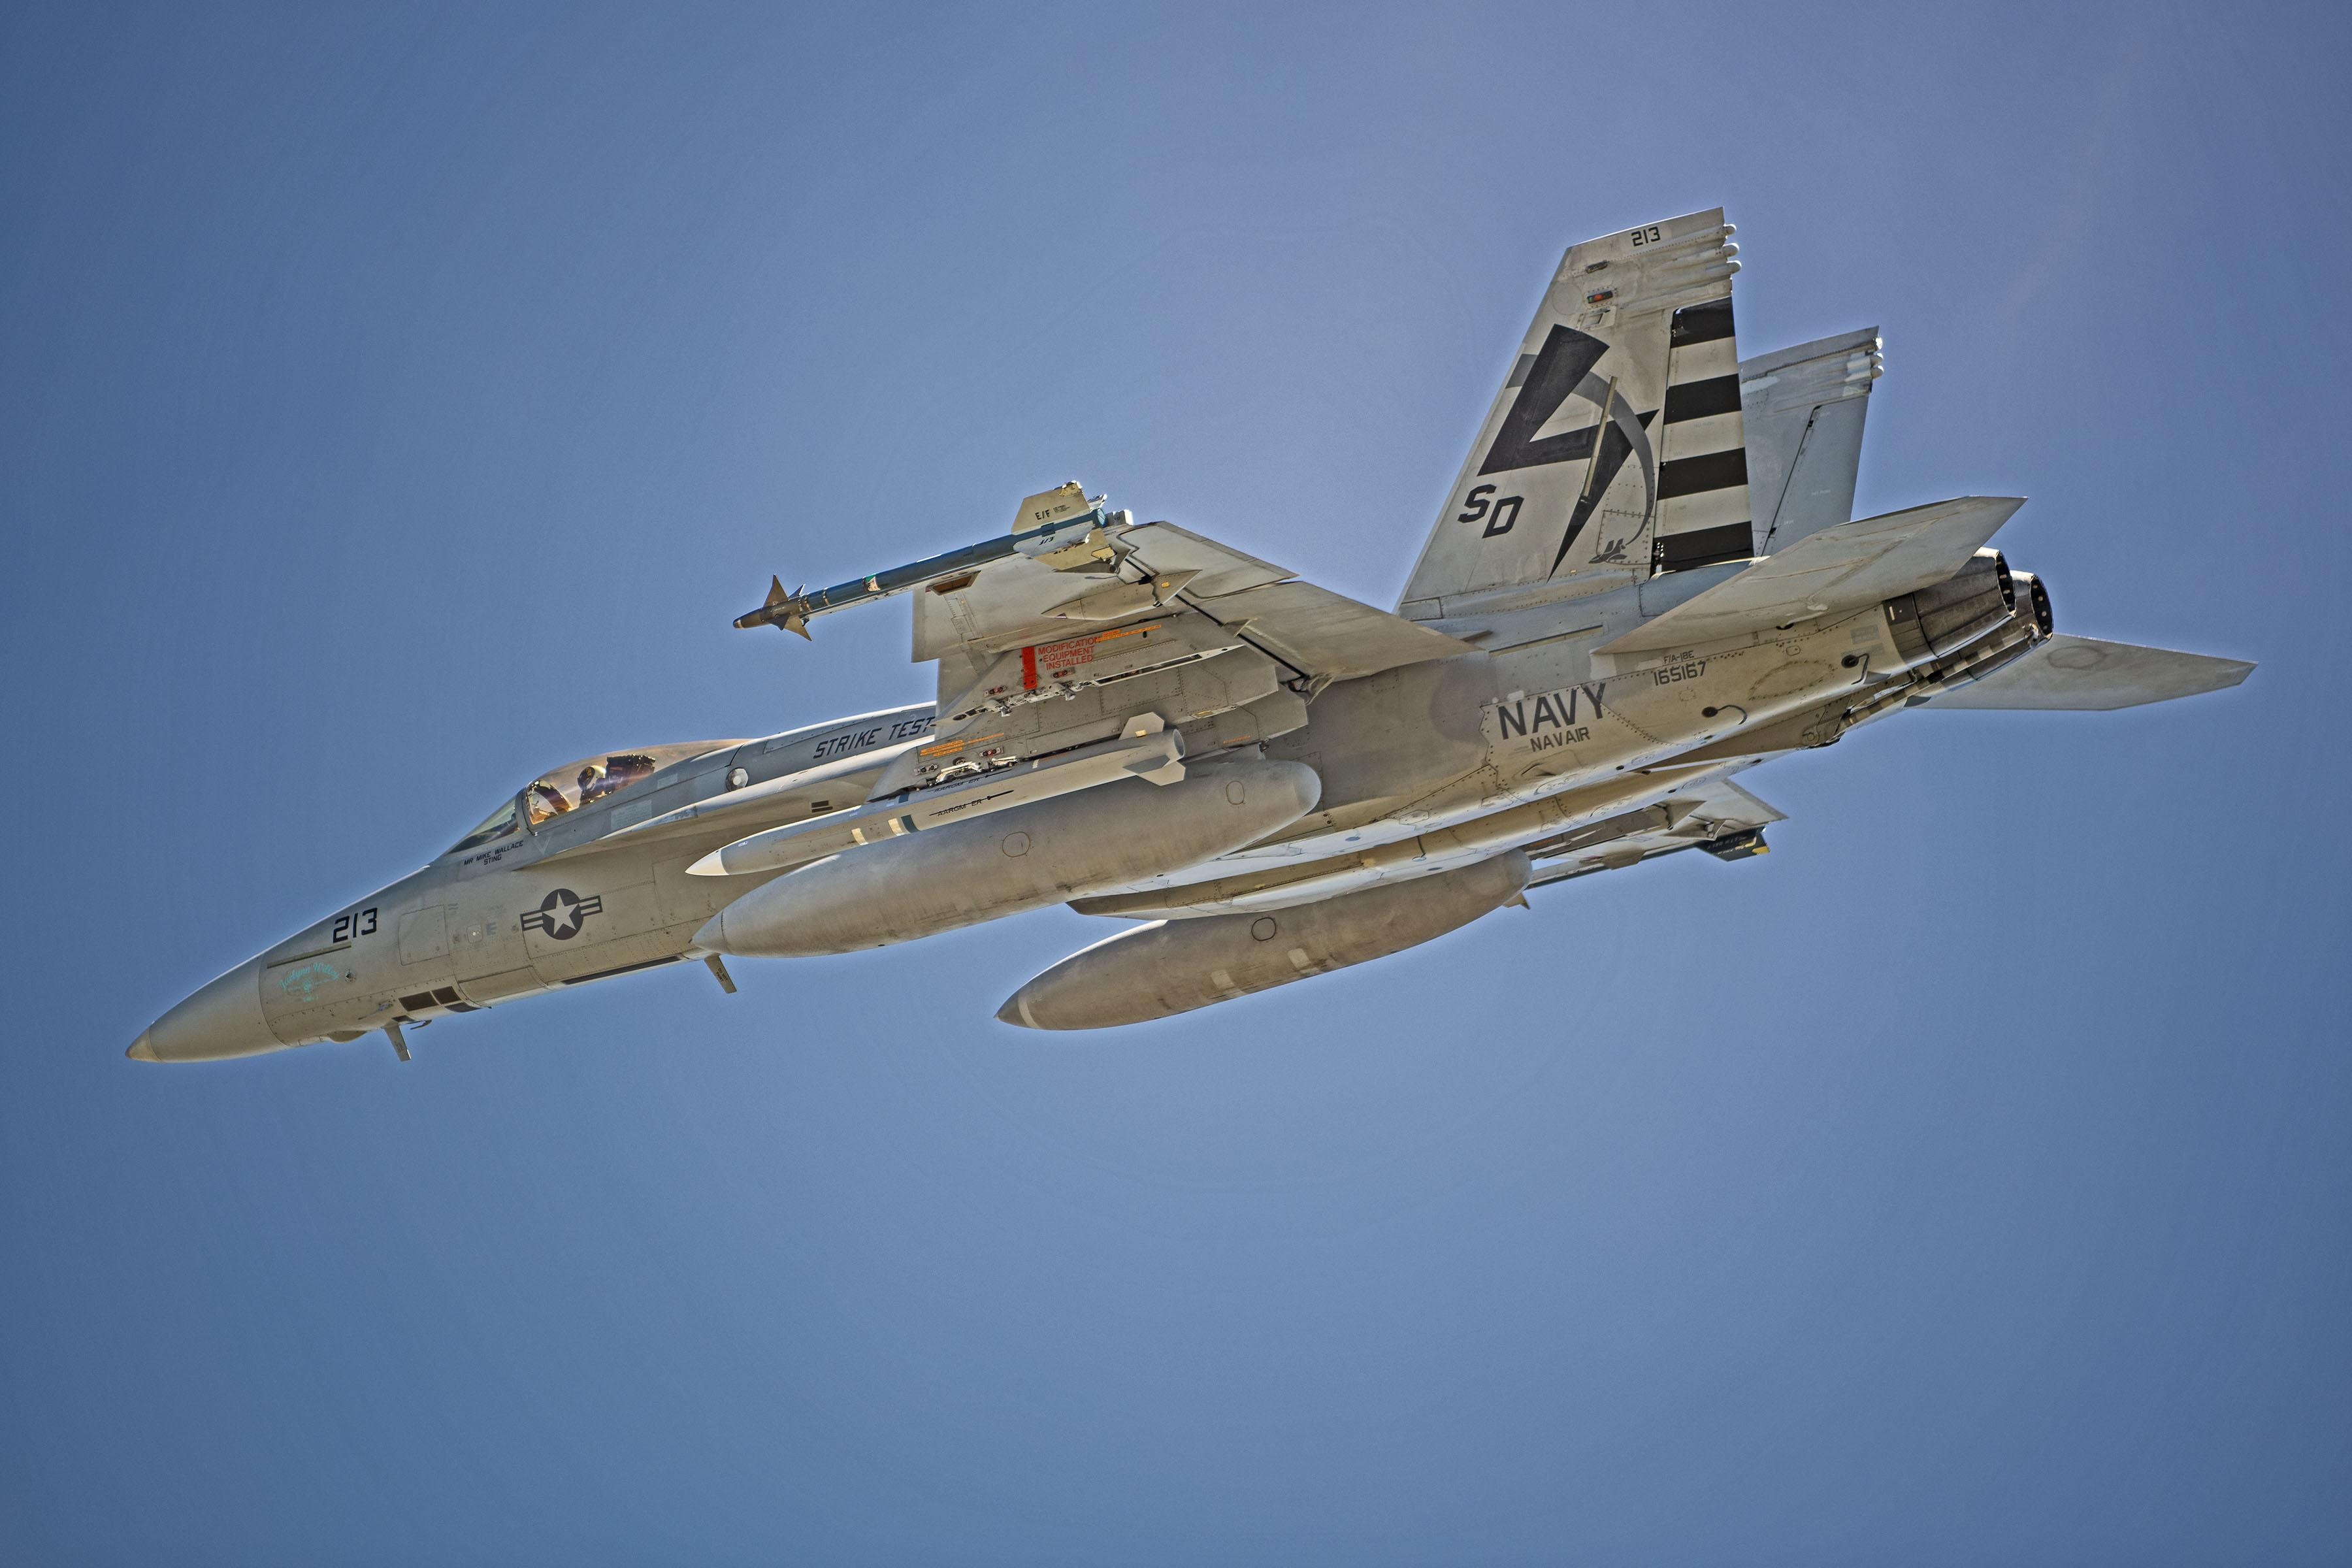 U.S. Navy Completes First AARGM-ER Captive Carry Flight on F/A-18 Super Hornet